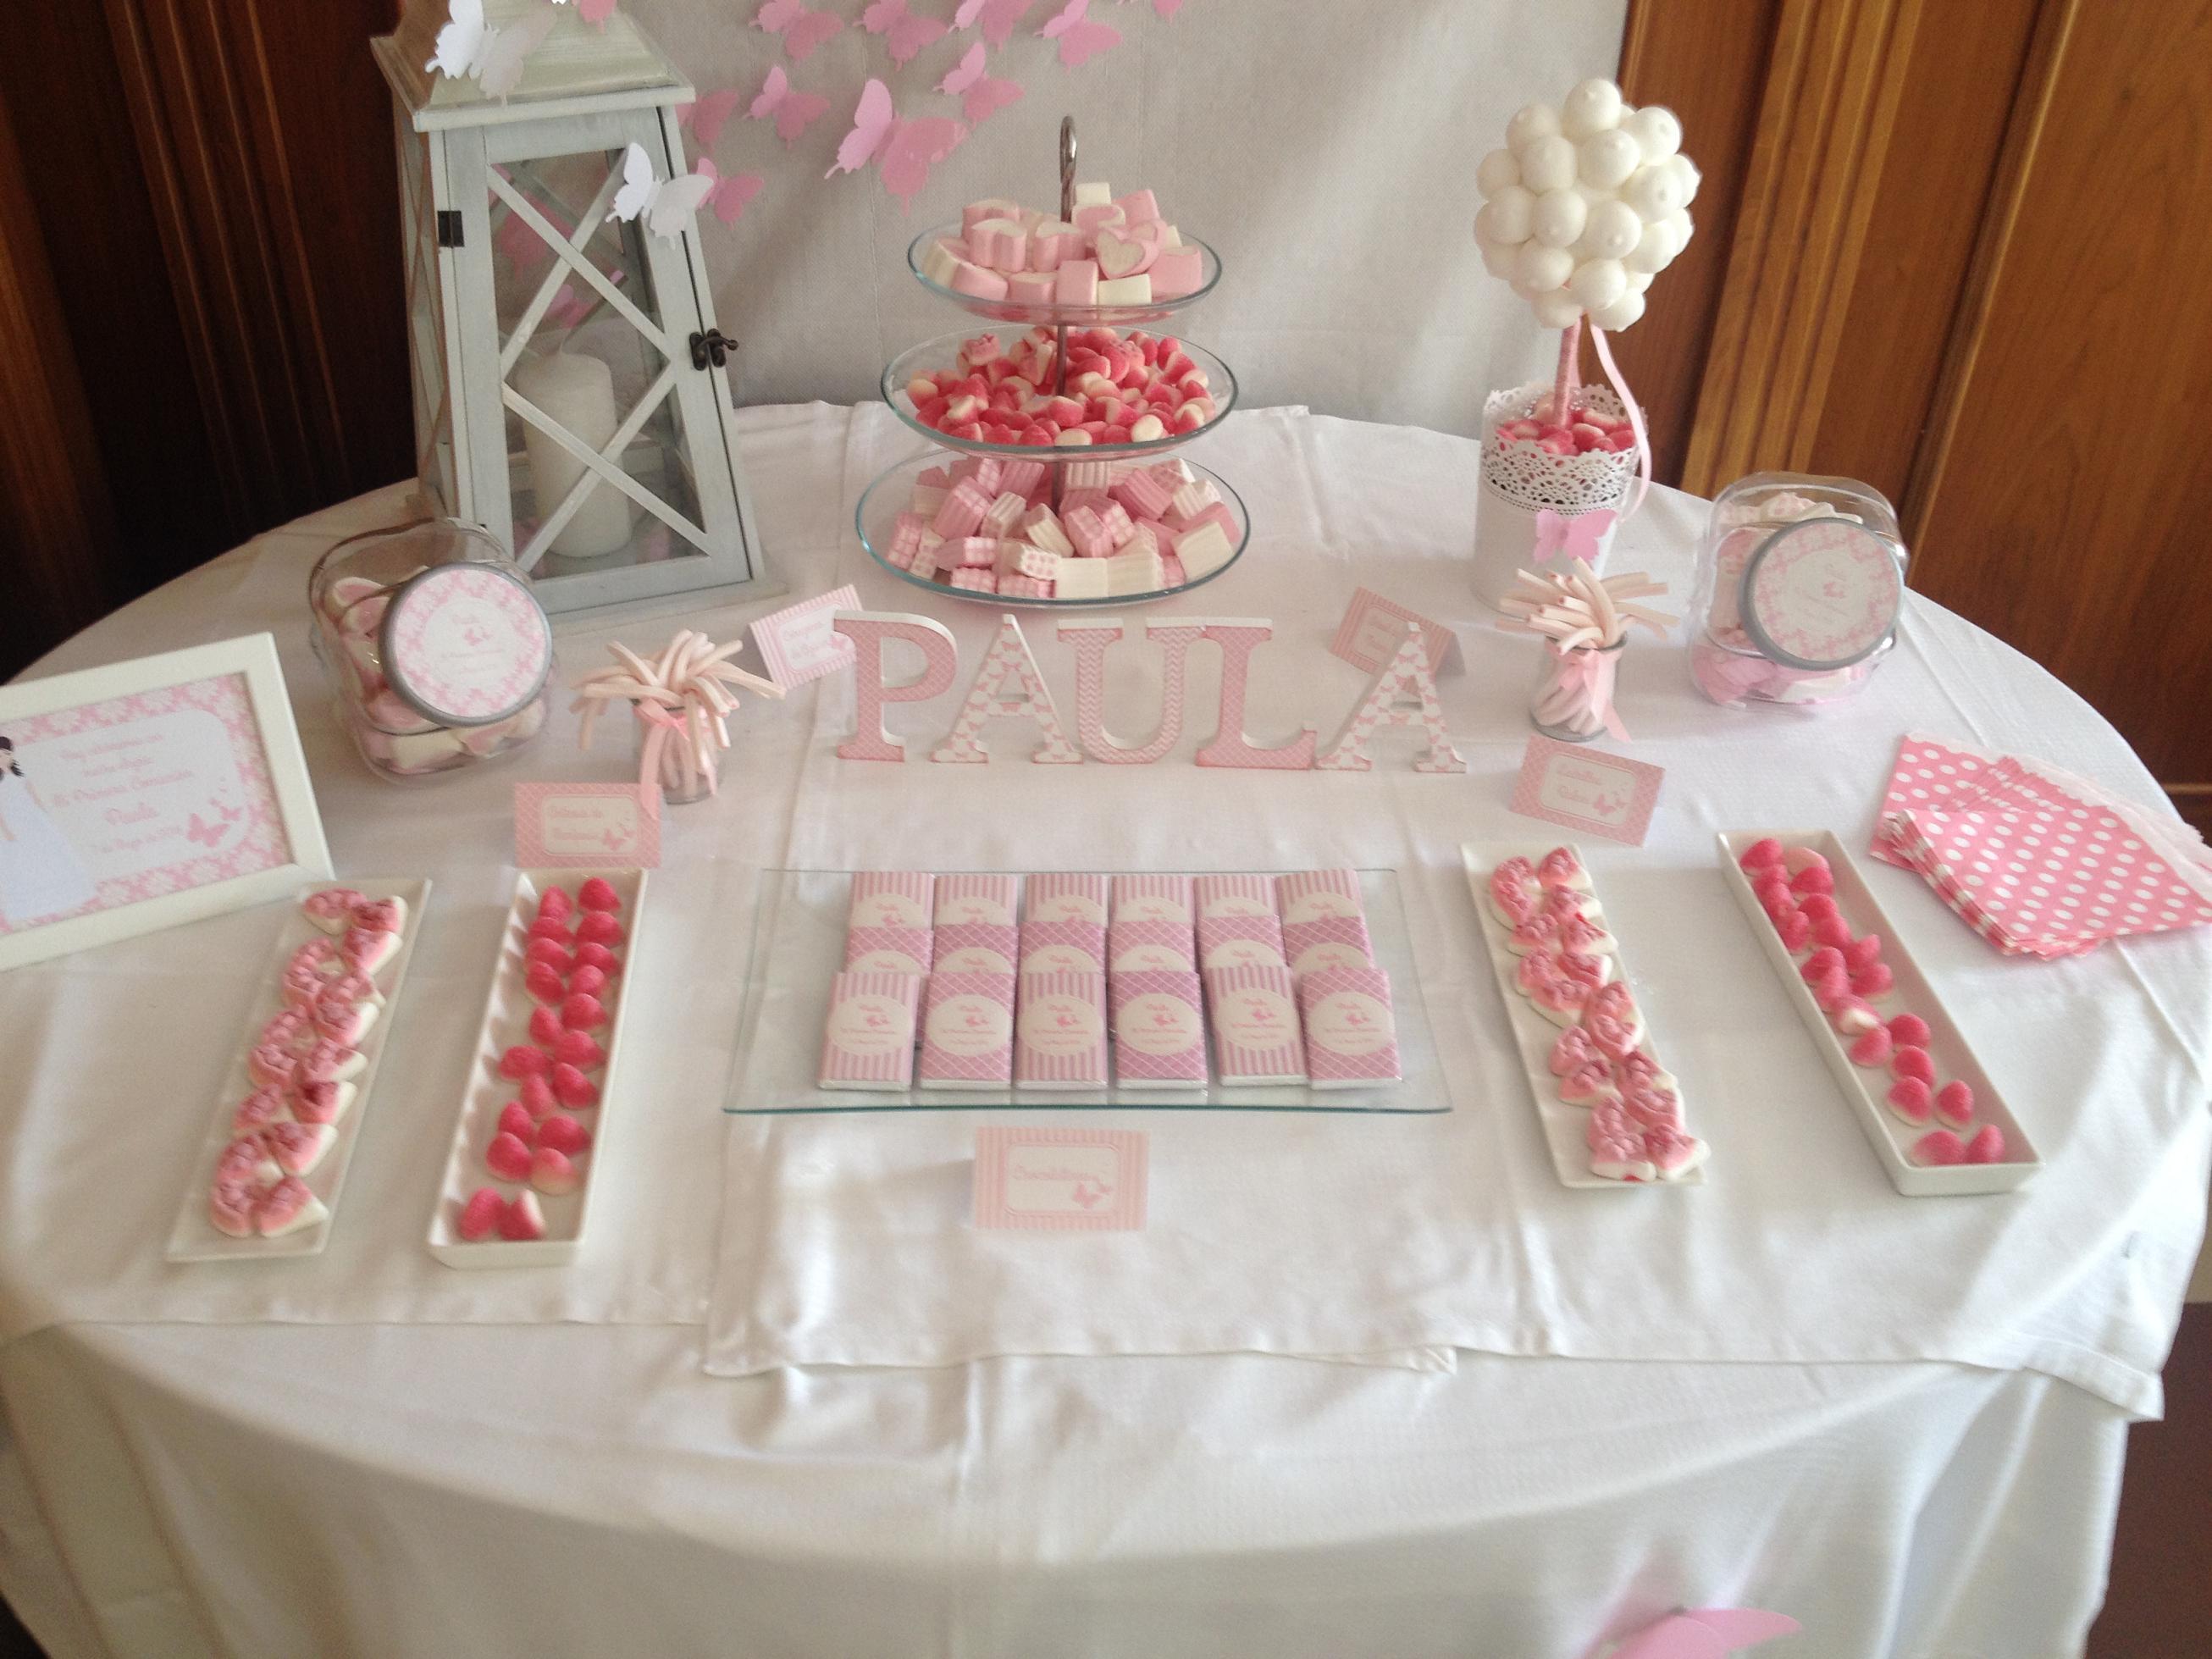 Primera comuni n mesa dulce rosa y mariposas en un for Mesas dulces comunion nina